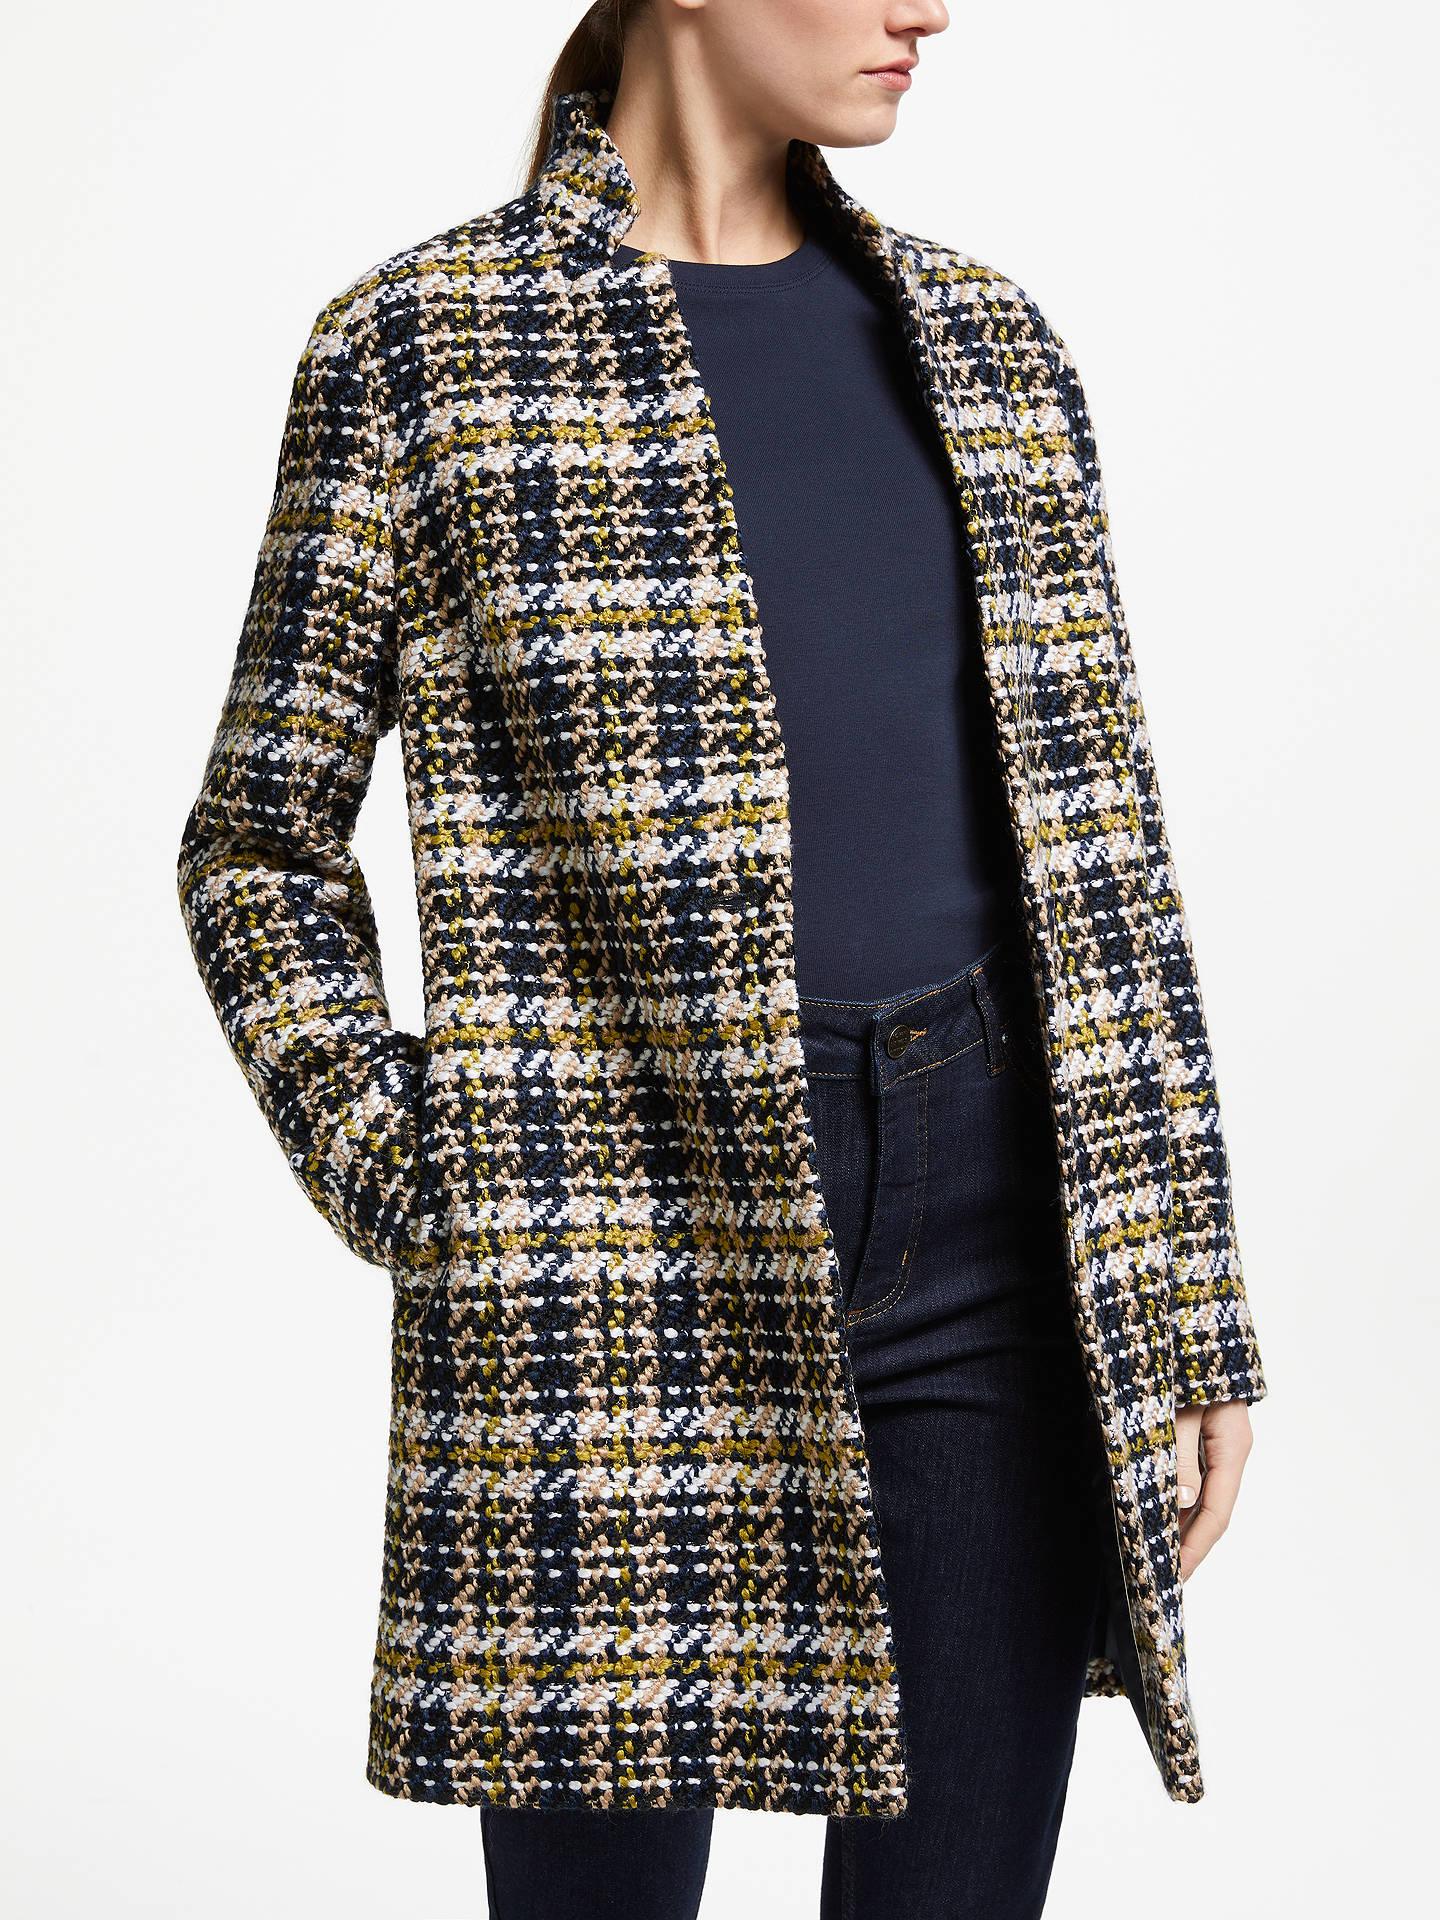 898a71c0f8 Buy John Lewis   Partners Notch Collar Check Textured Coat